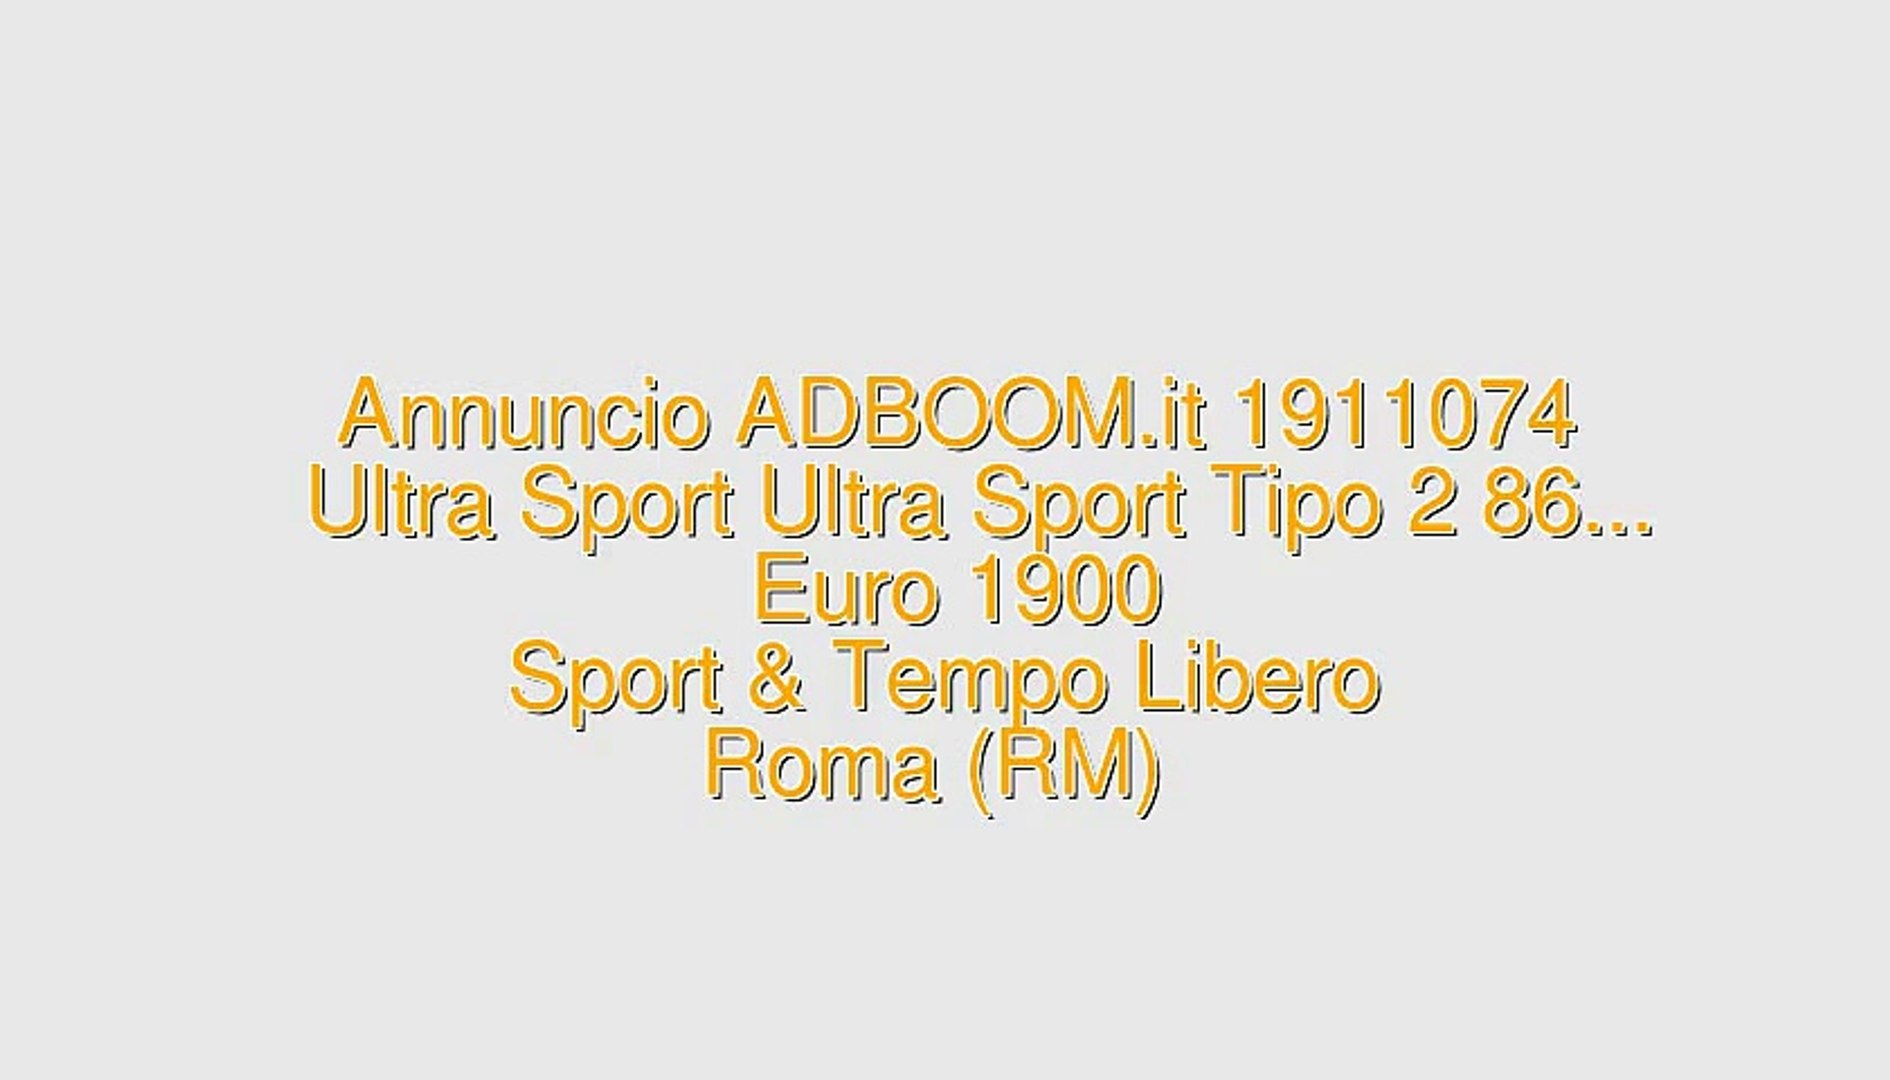 Ultra Sport Ultra Sport Tipo 2 86...